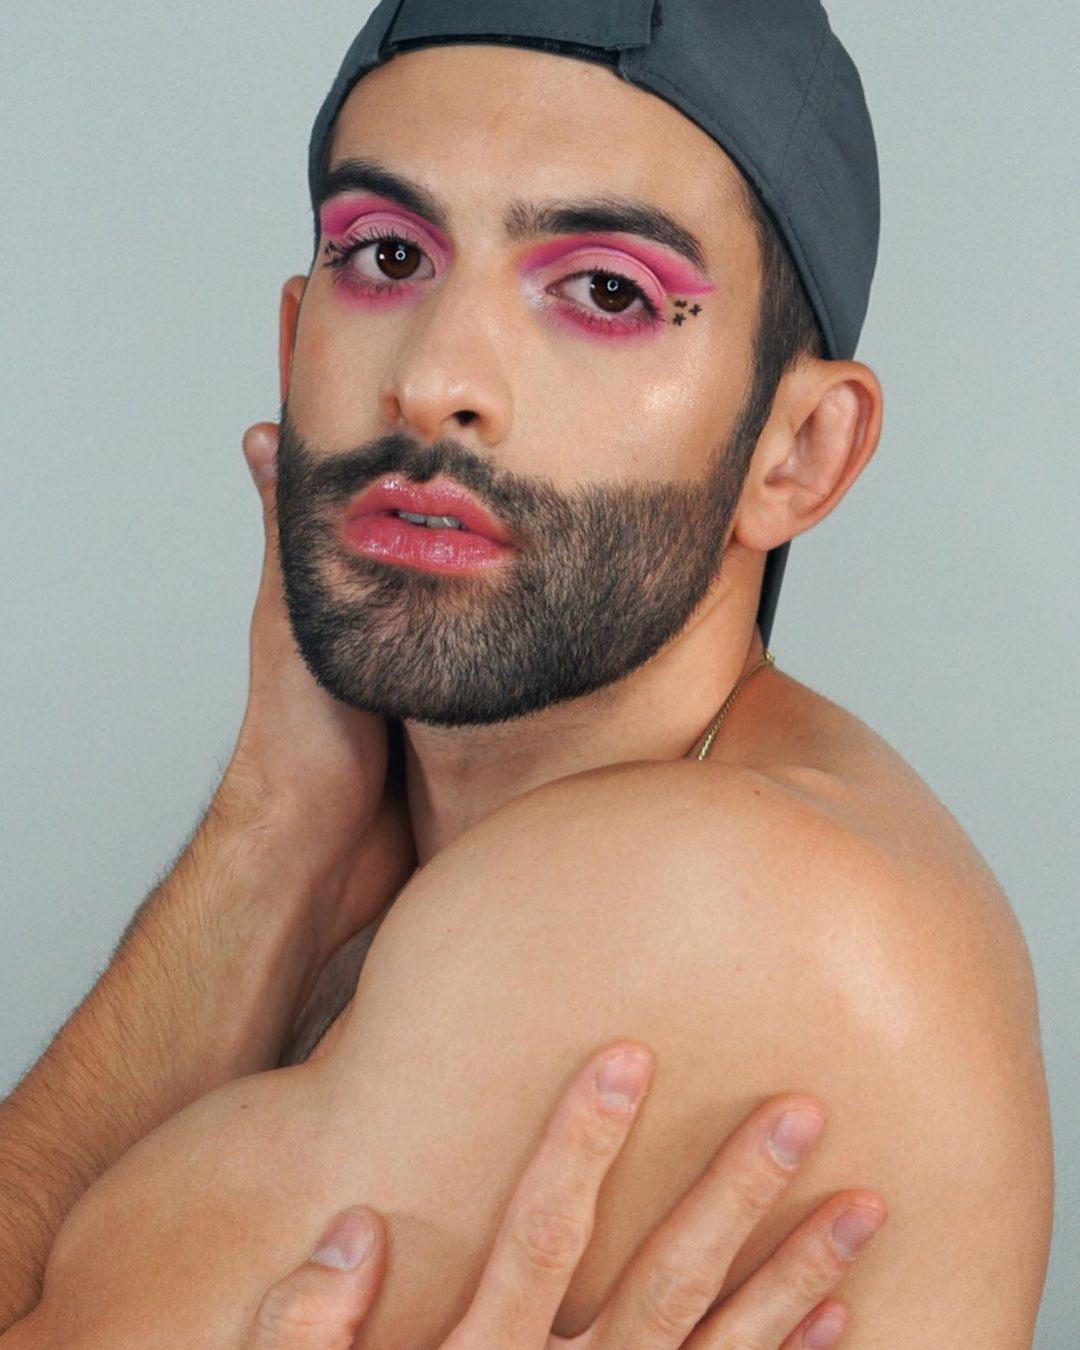 Nick Grant Loves his Dominic Paul cosmetics contour palette